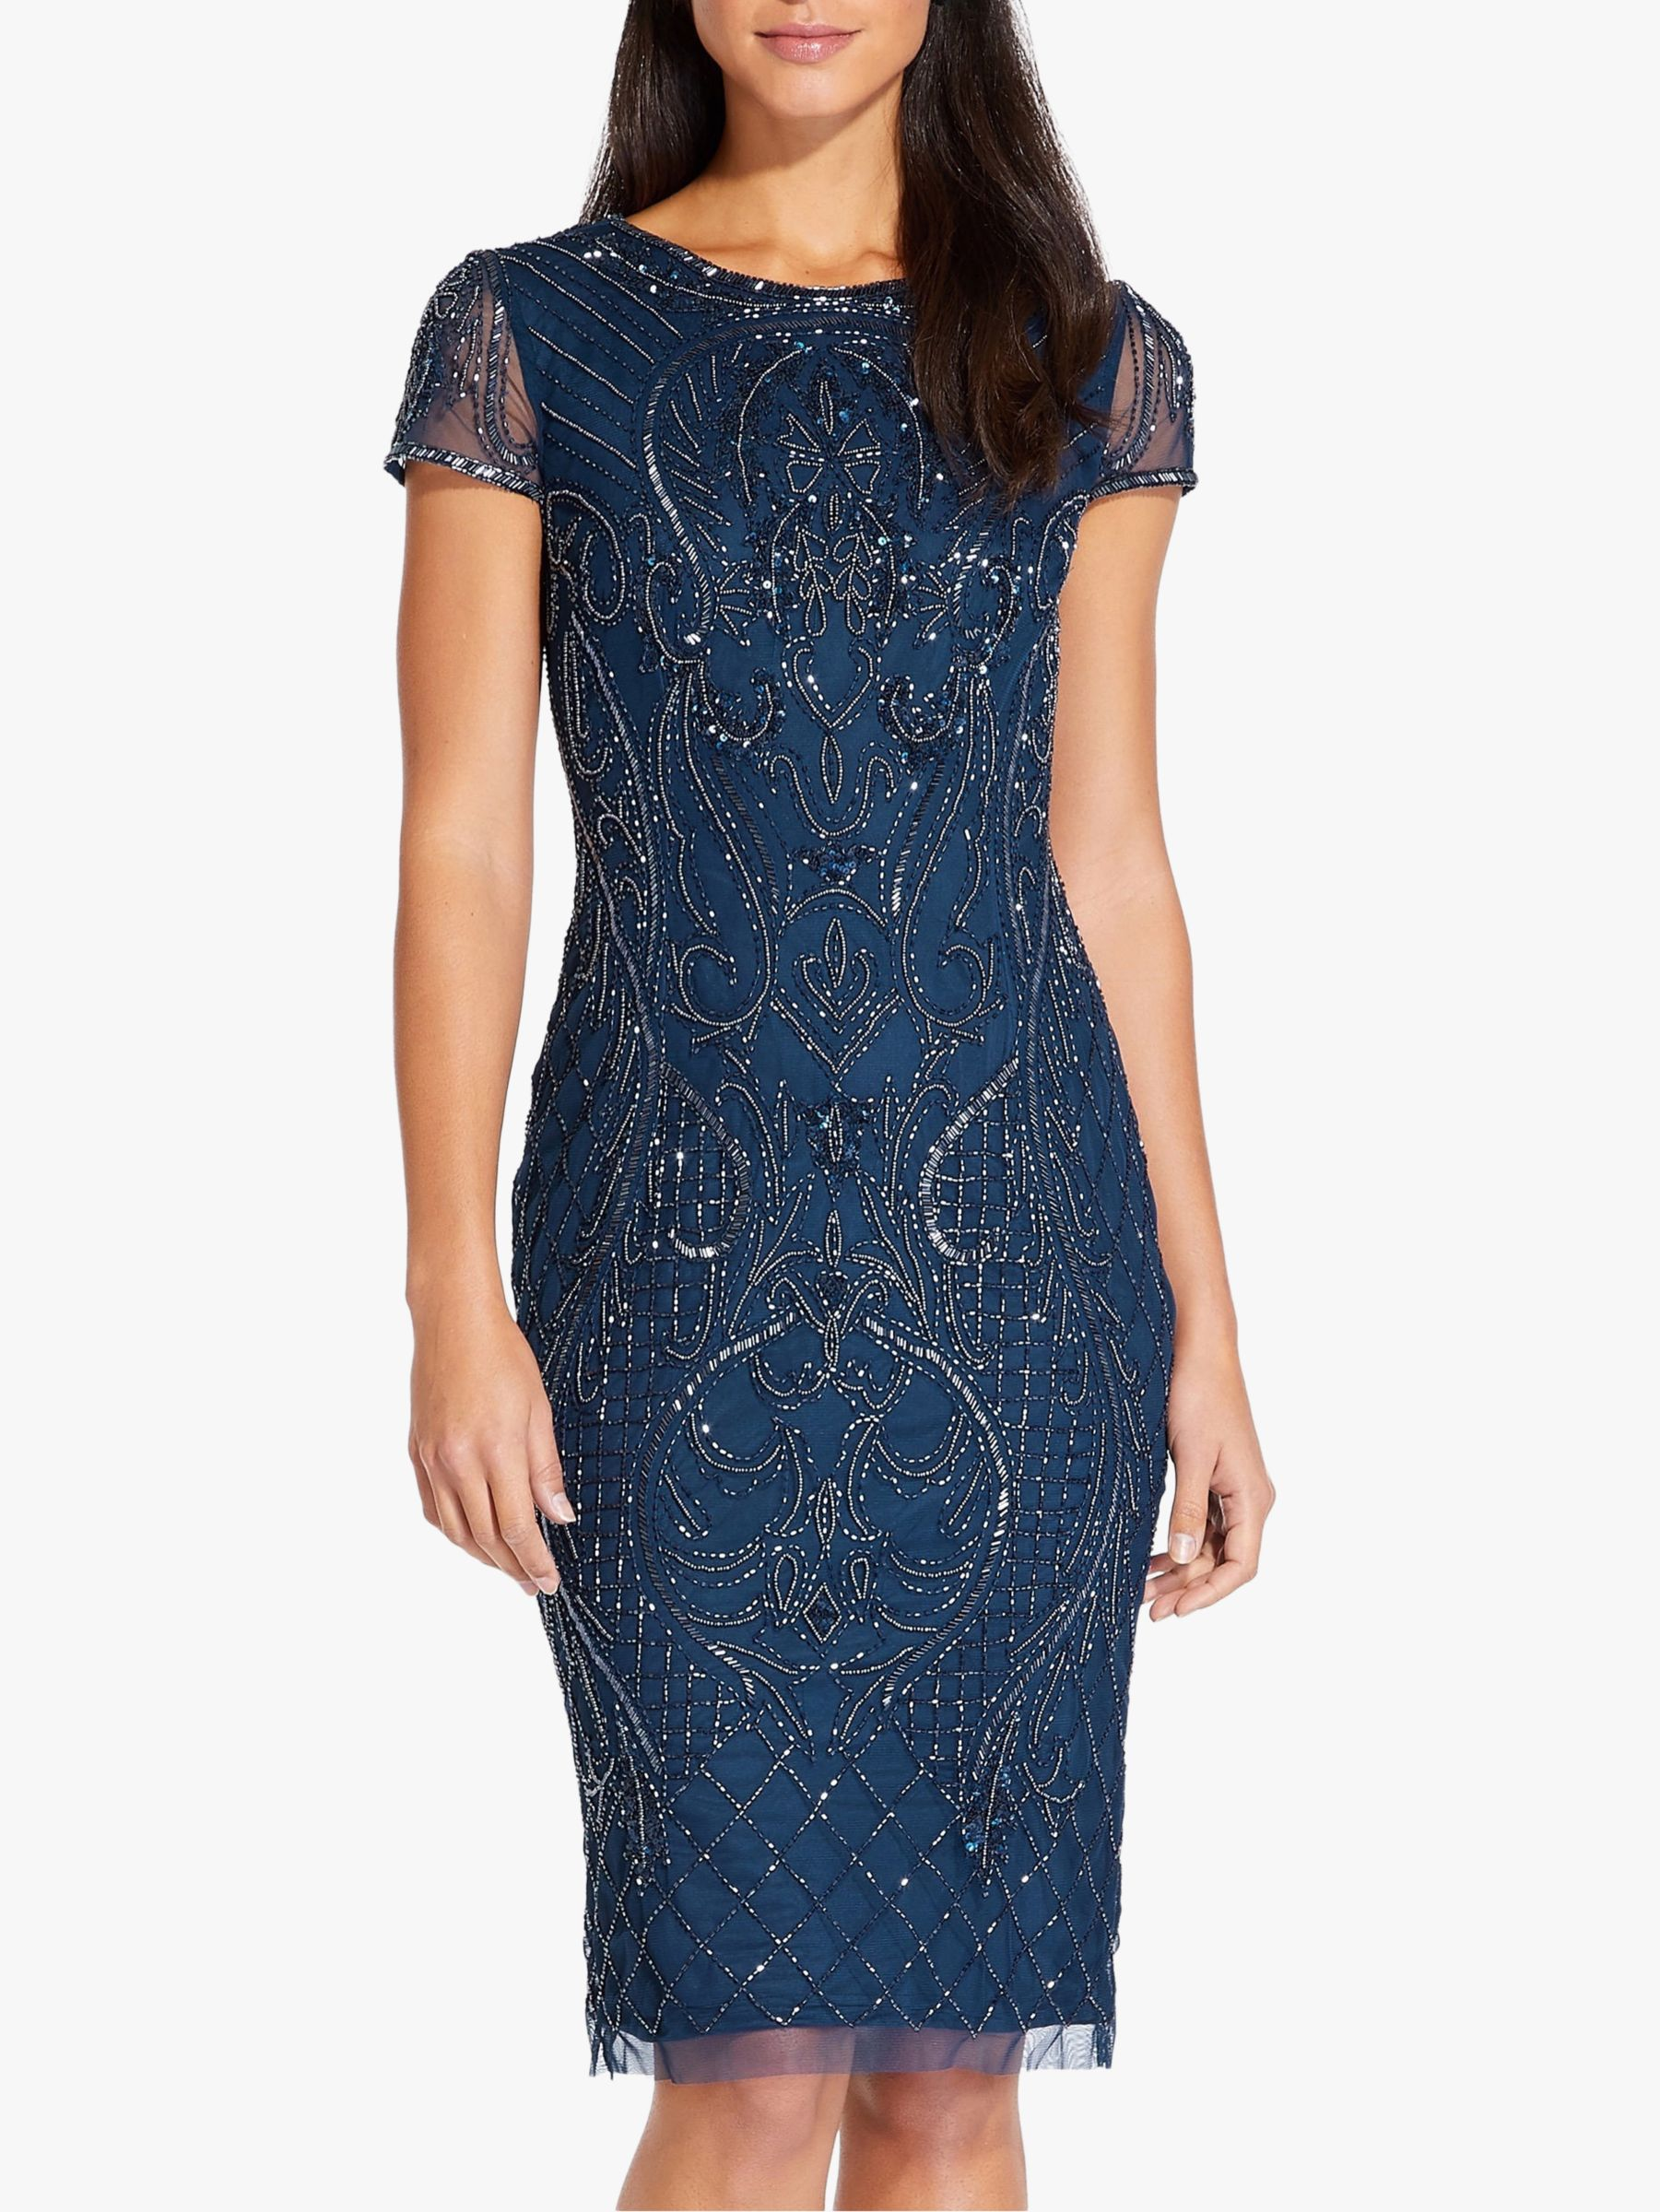 Adrianna Papell Adrianna Papell Short Beaded Dress, Deep Blue